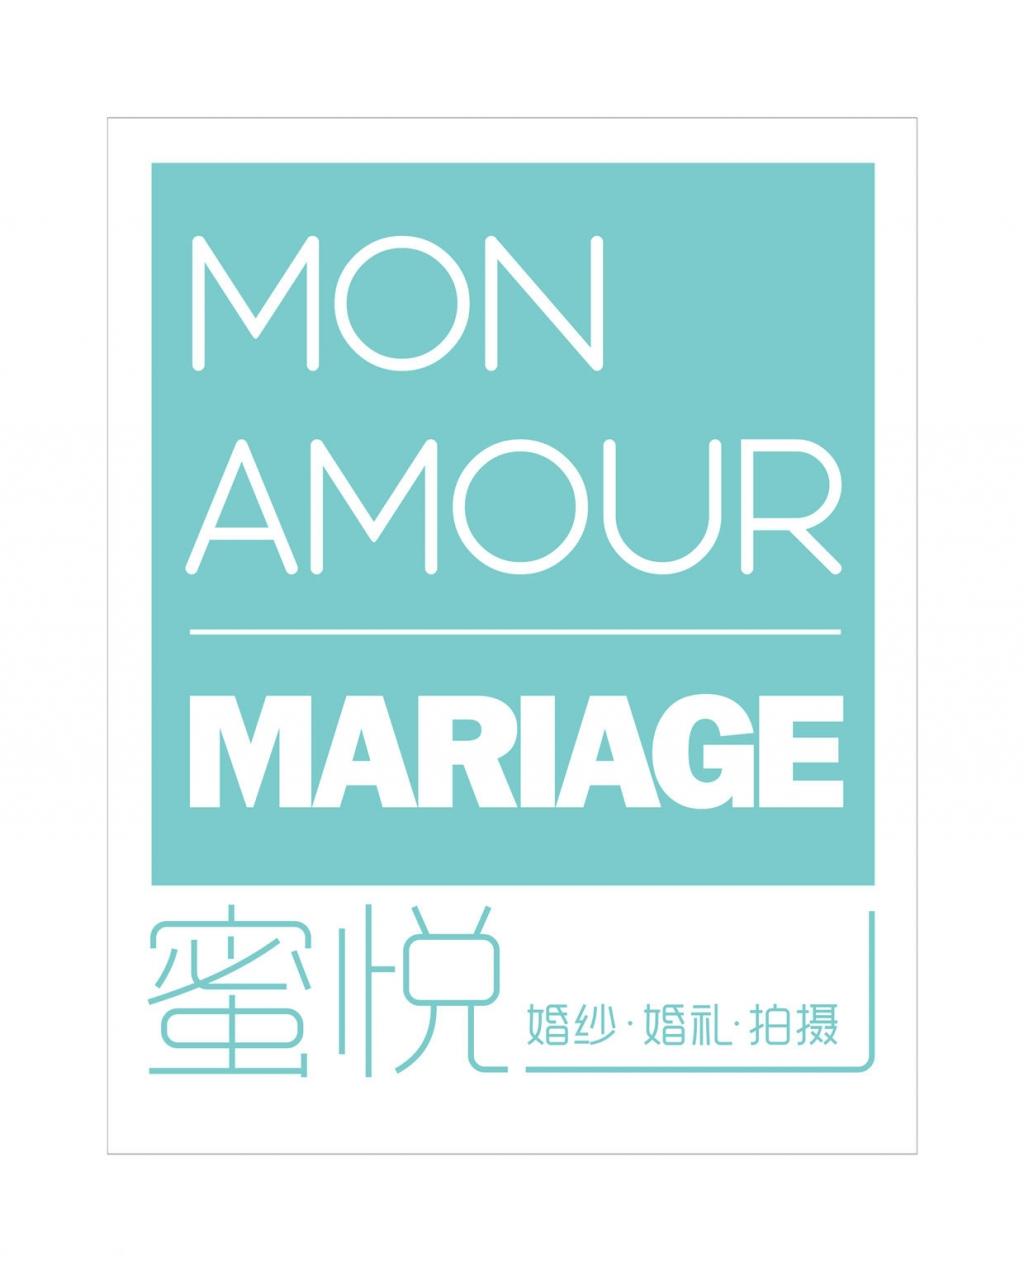 mon amour 2016蜜悦旅拍海外婚纱摄影【巴黎旗舰店盛大开业】